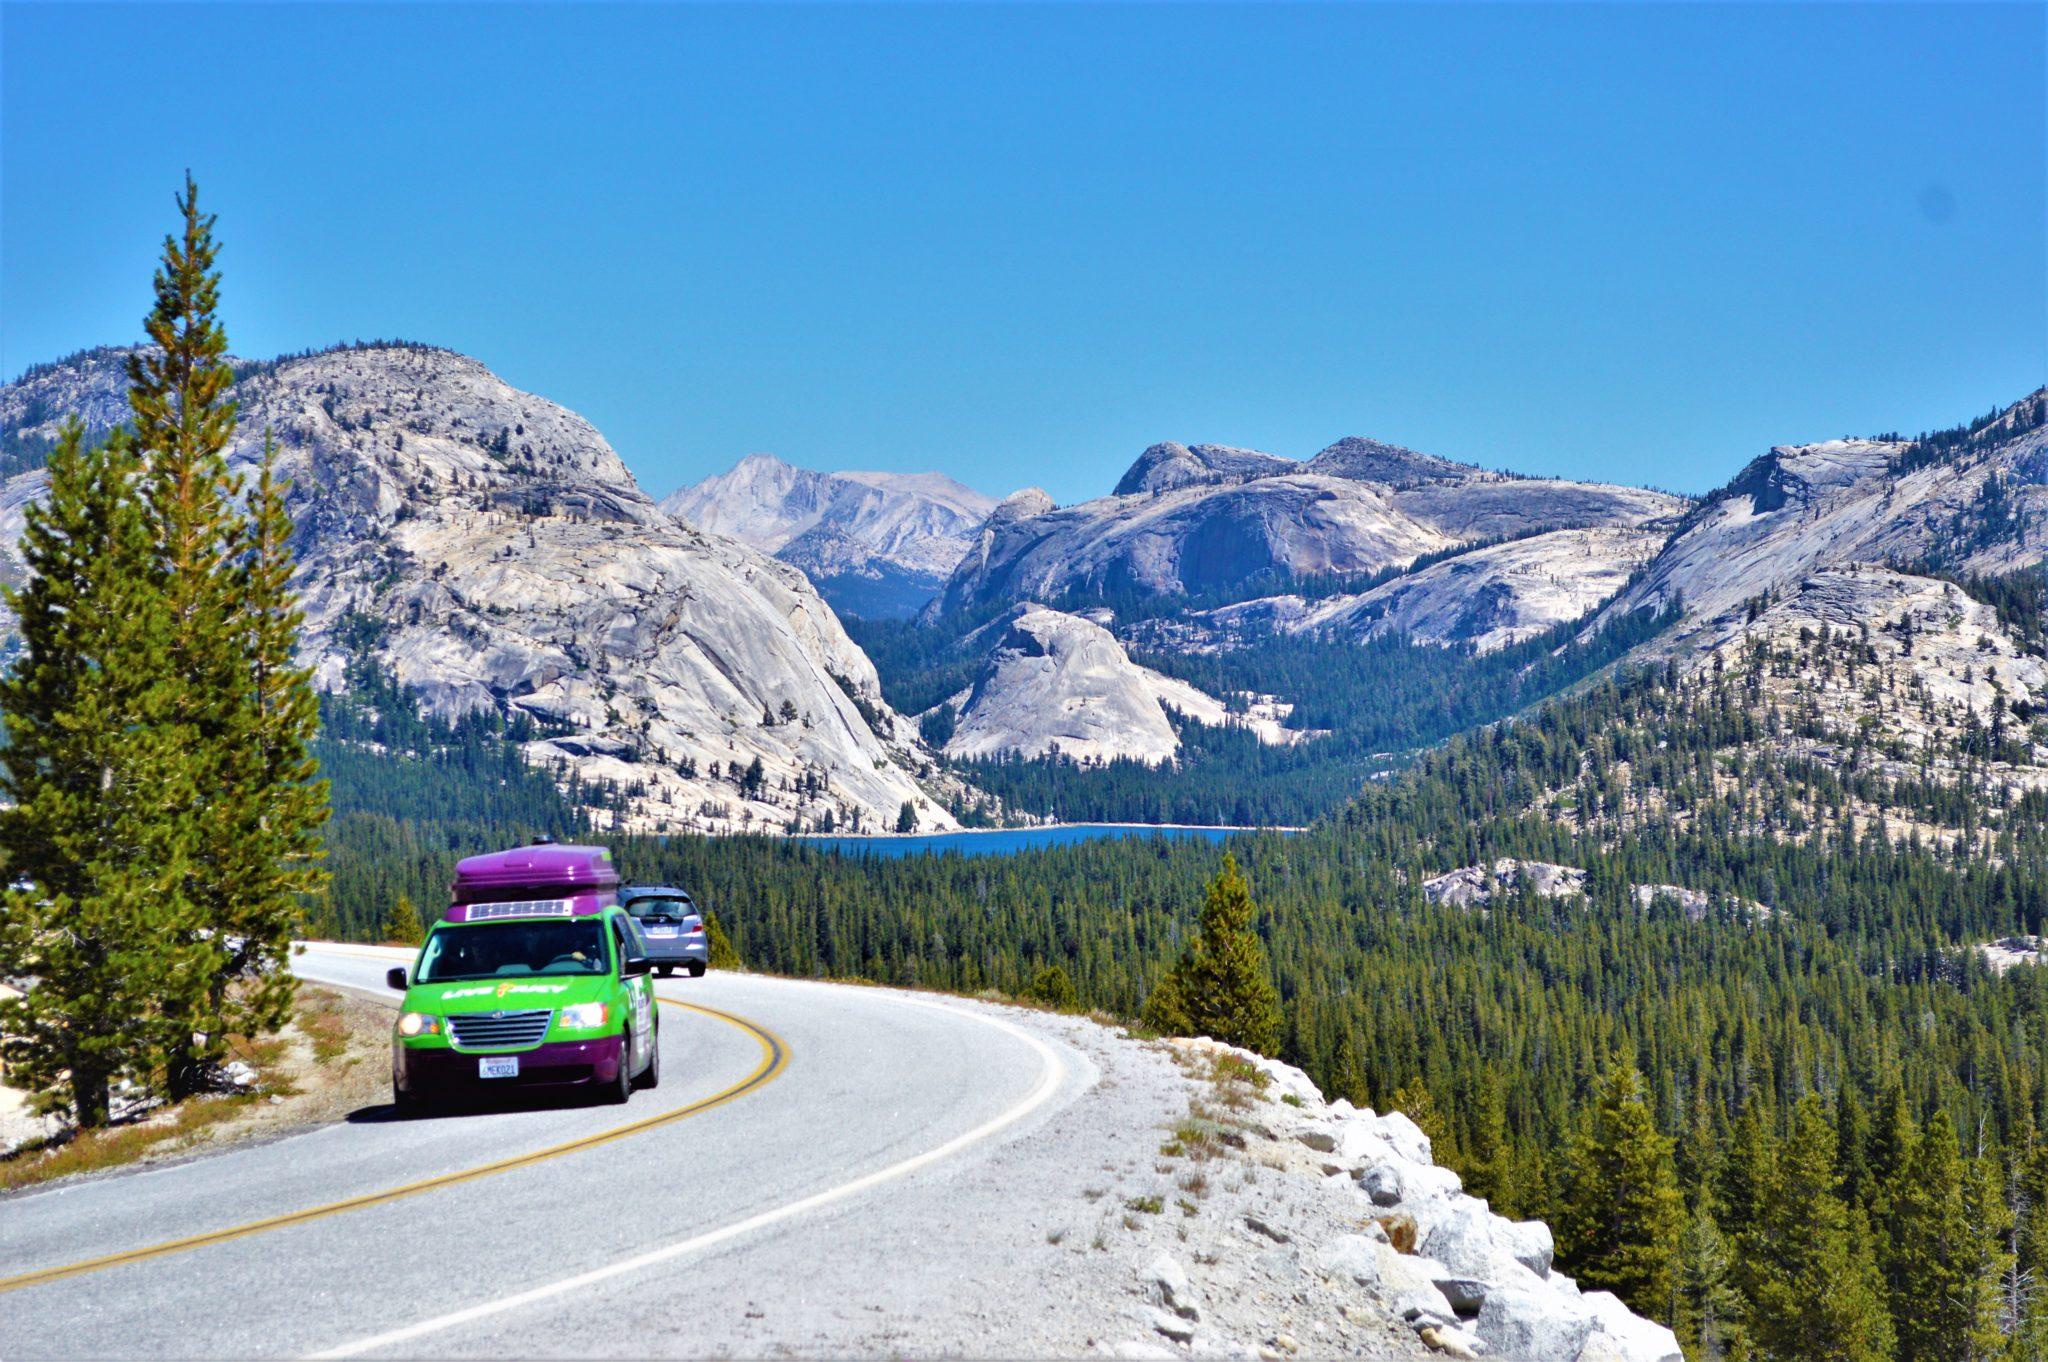 Road through Yosemite National Park, California, things to do at yosemite